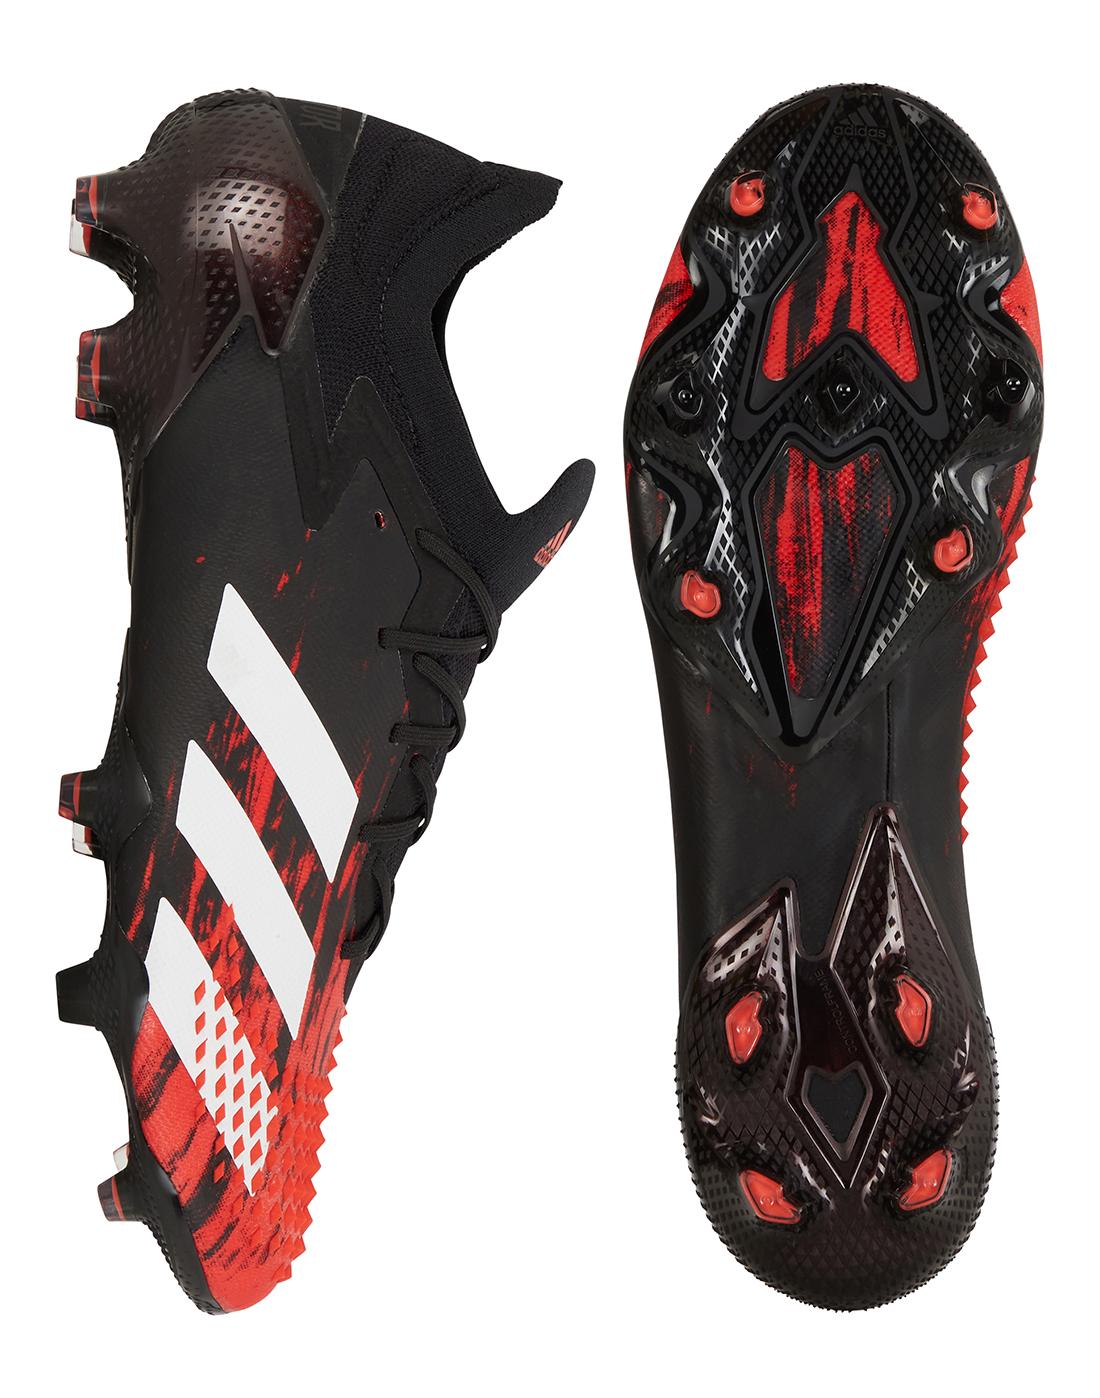 adidas predator youth soccer cleats OFF79% www.otinet.ir!